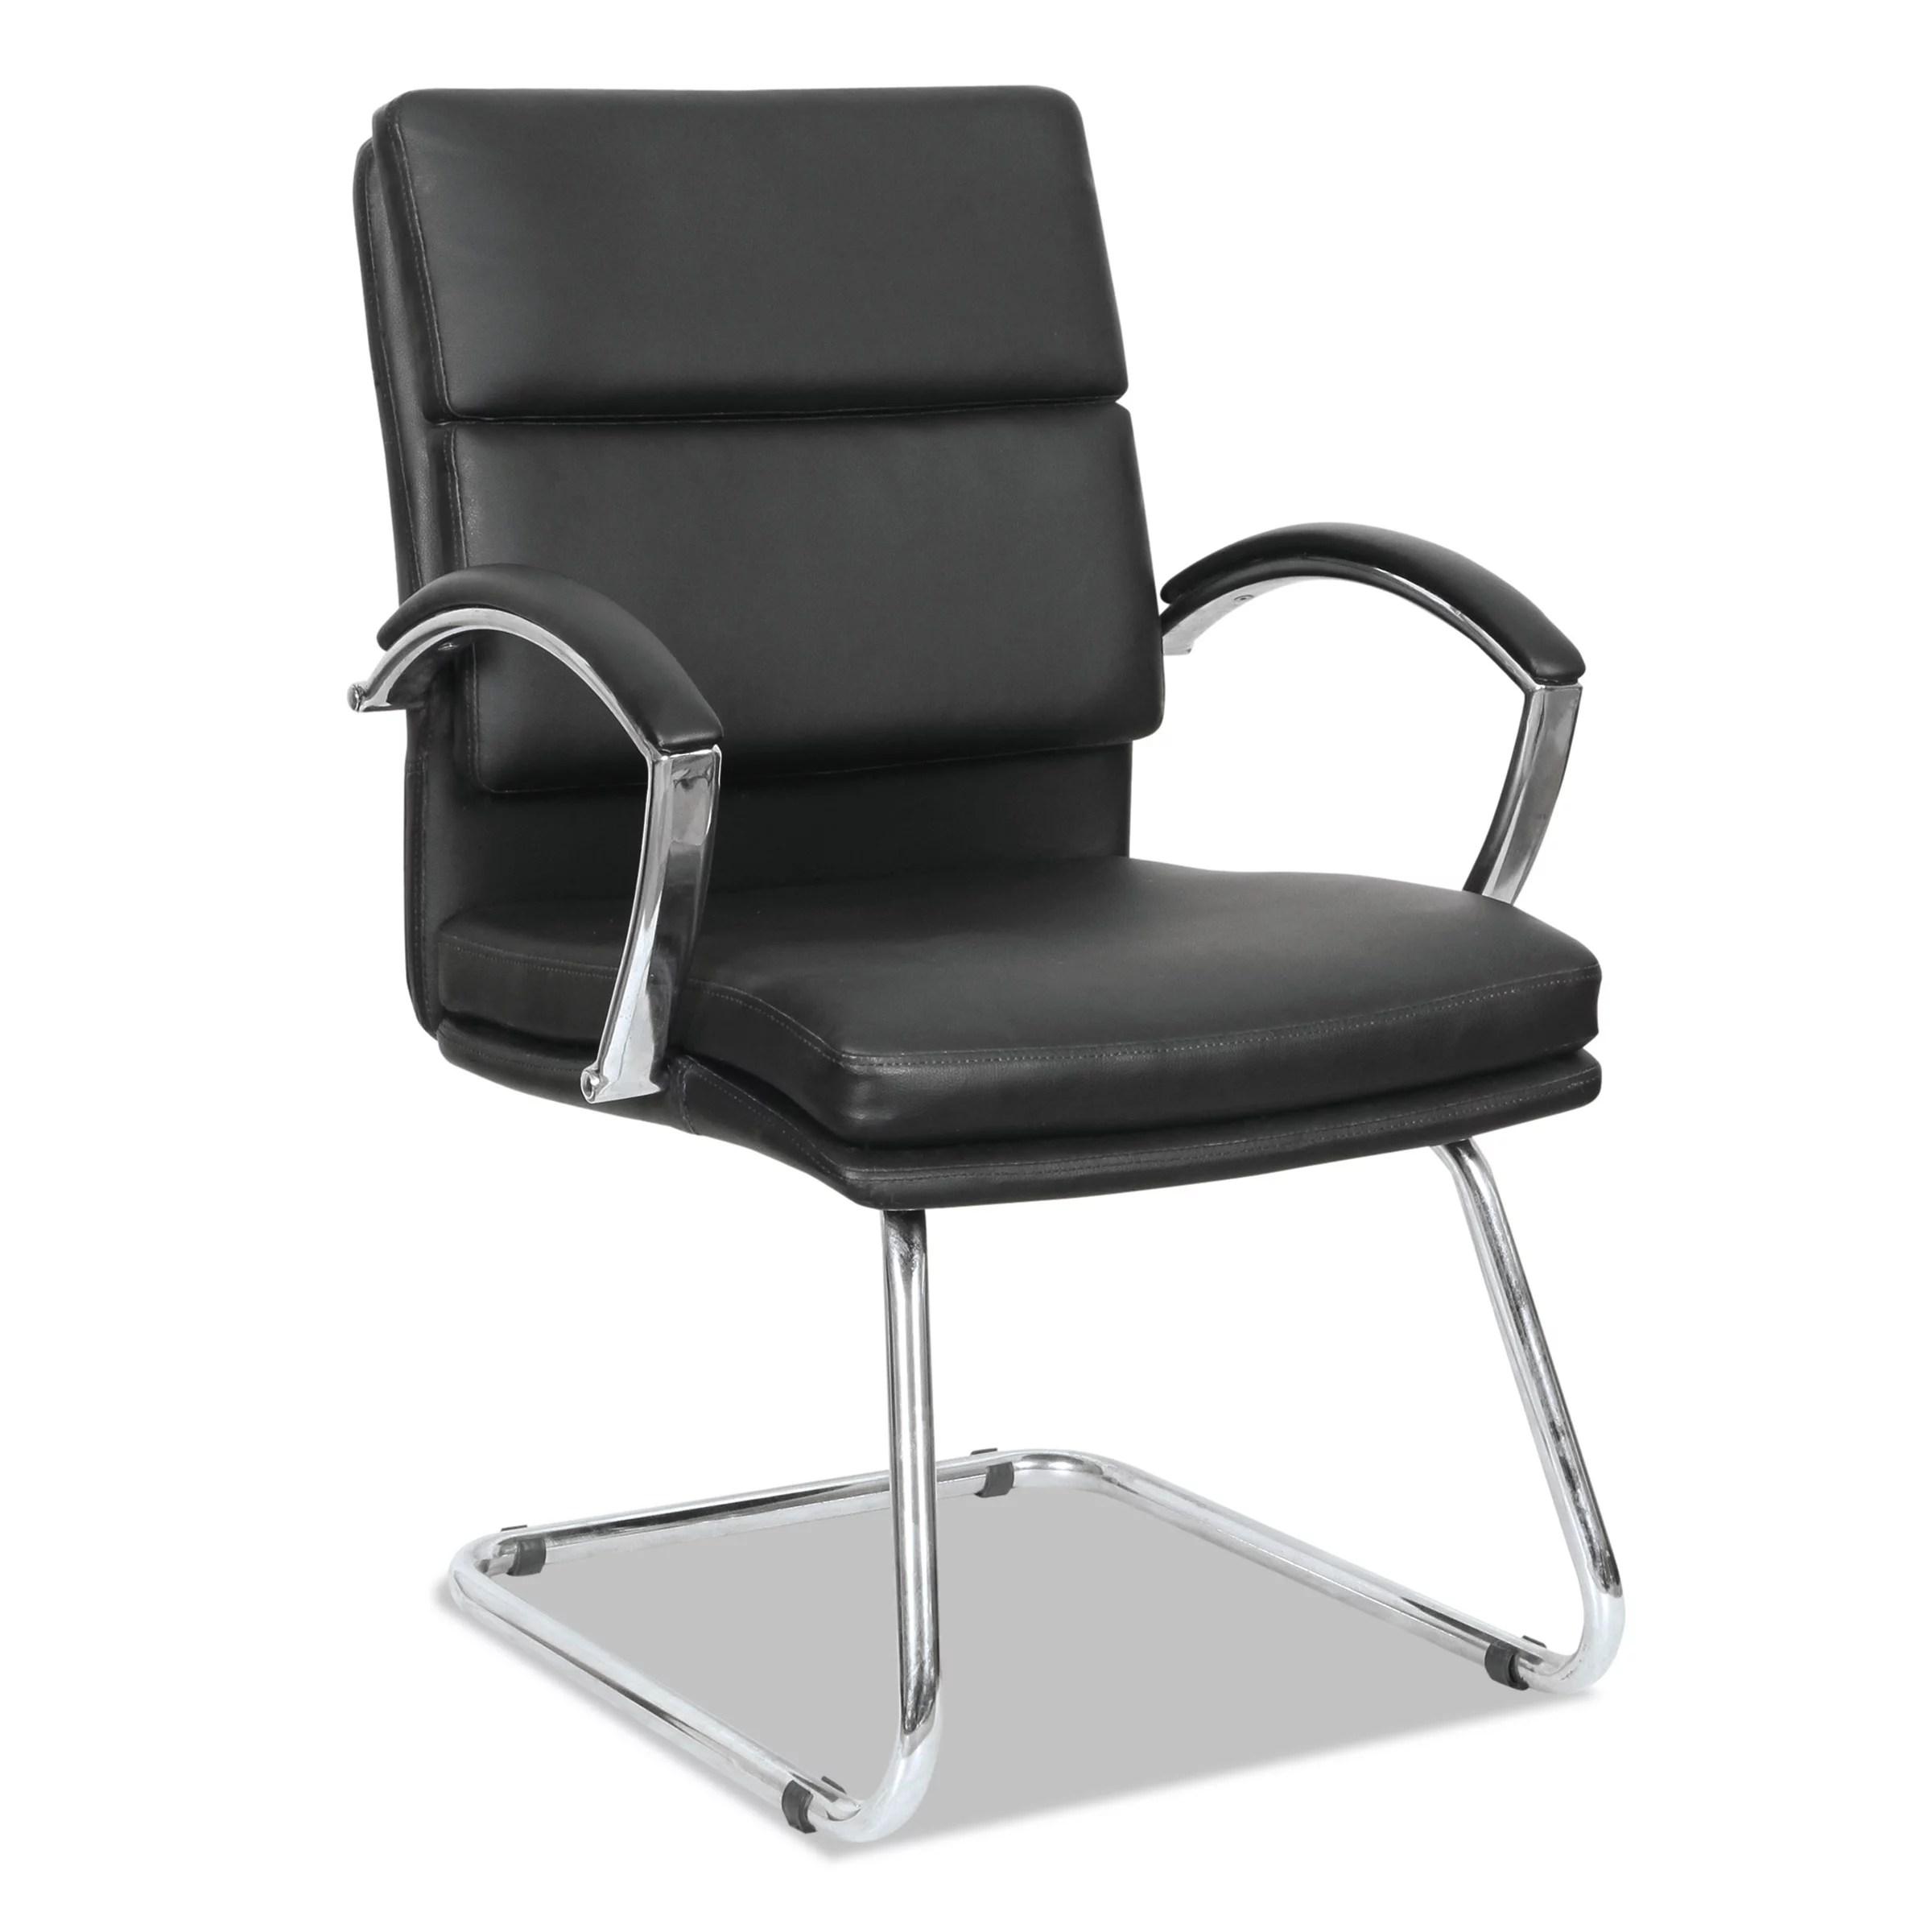 leather chrome chair baby bjorn high alera neratoli series slim profile guest black soft frame walmart com